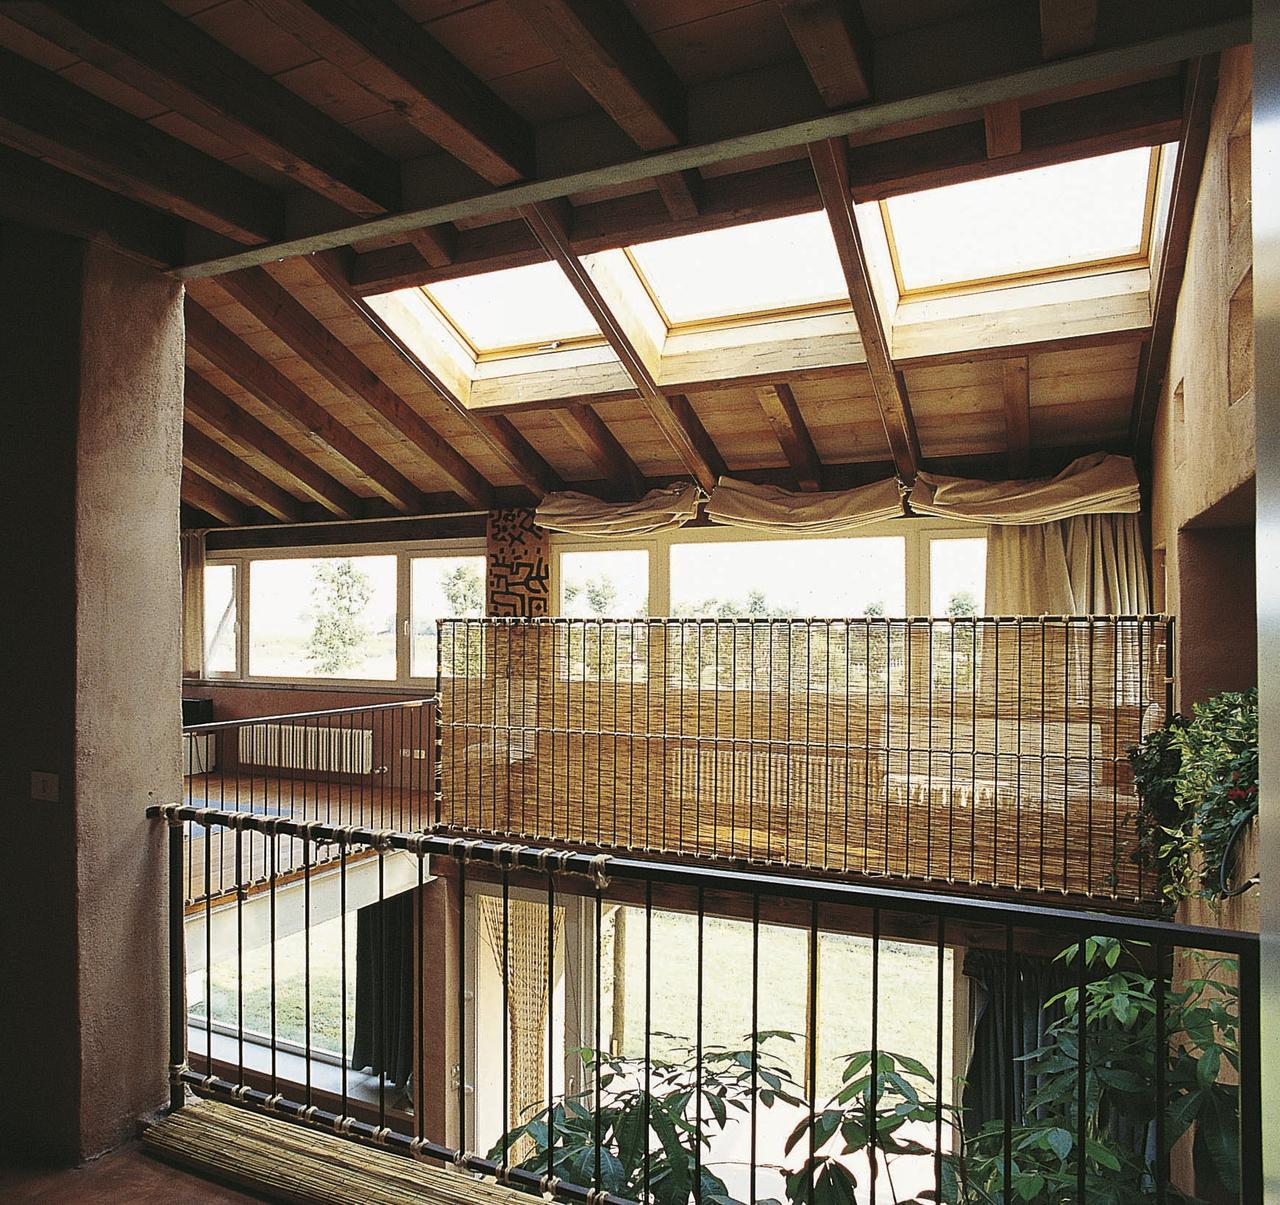 Da rustico a mansarda bioclimatica for Piani casa fienile rustico